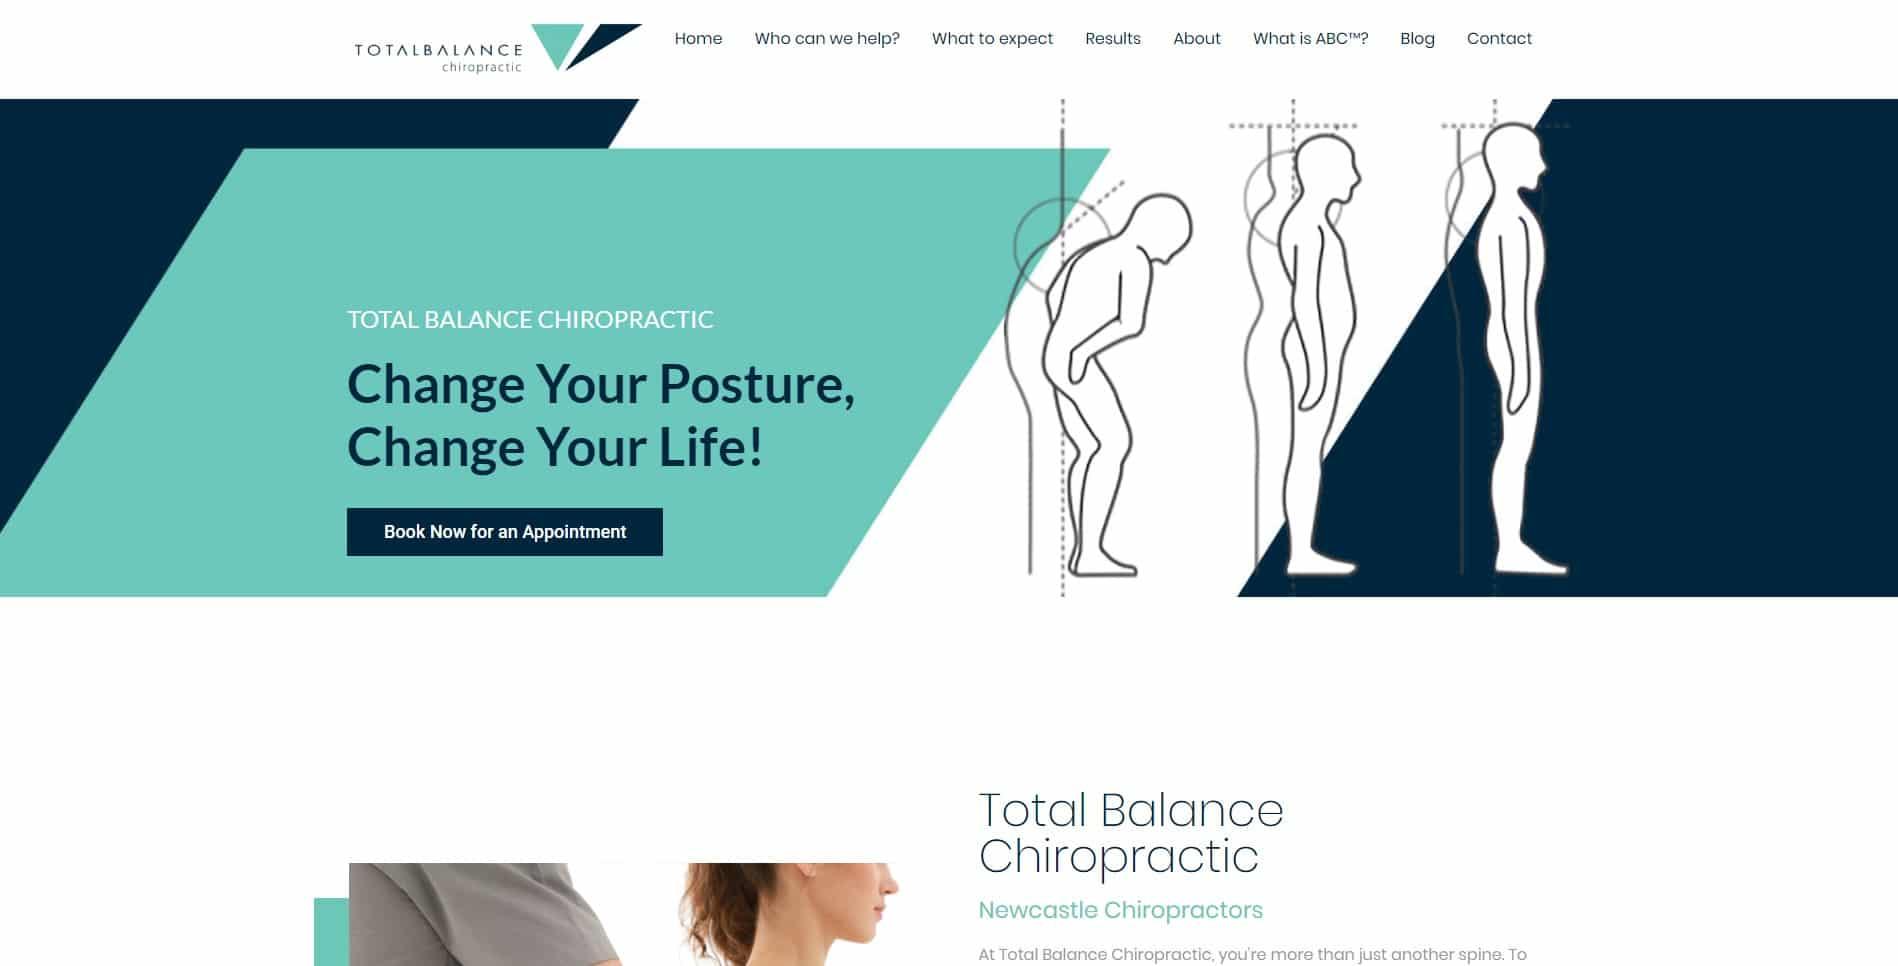 Total Balance Chiropractic Website Design & SEO Northern Rivers NSW - JezNorthWeb